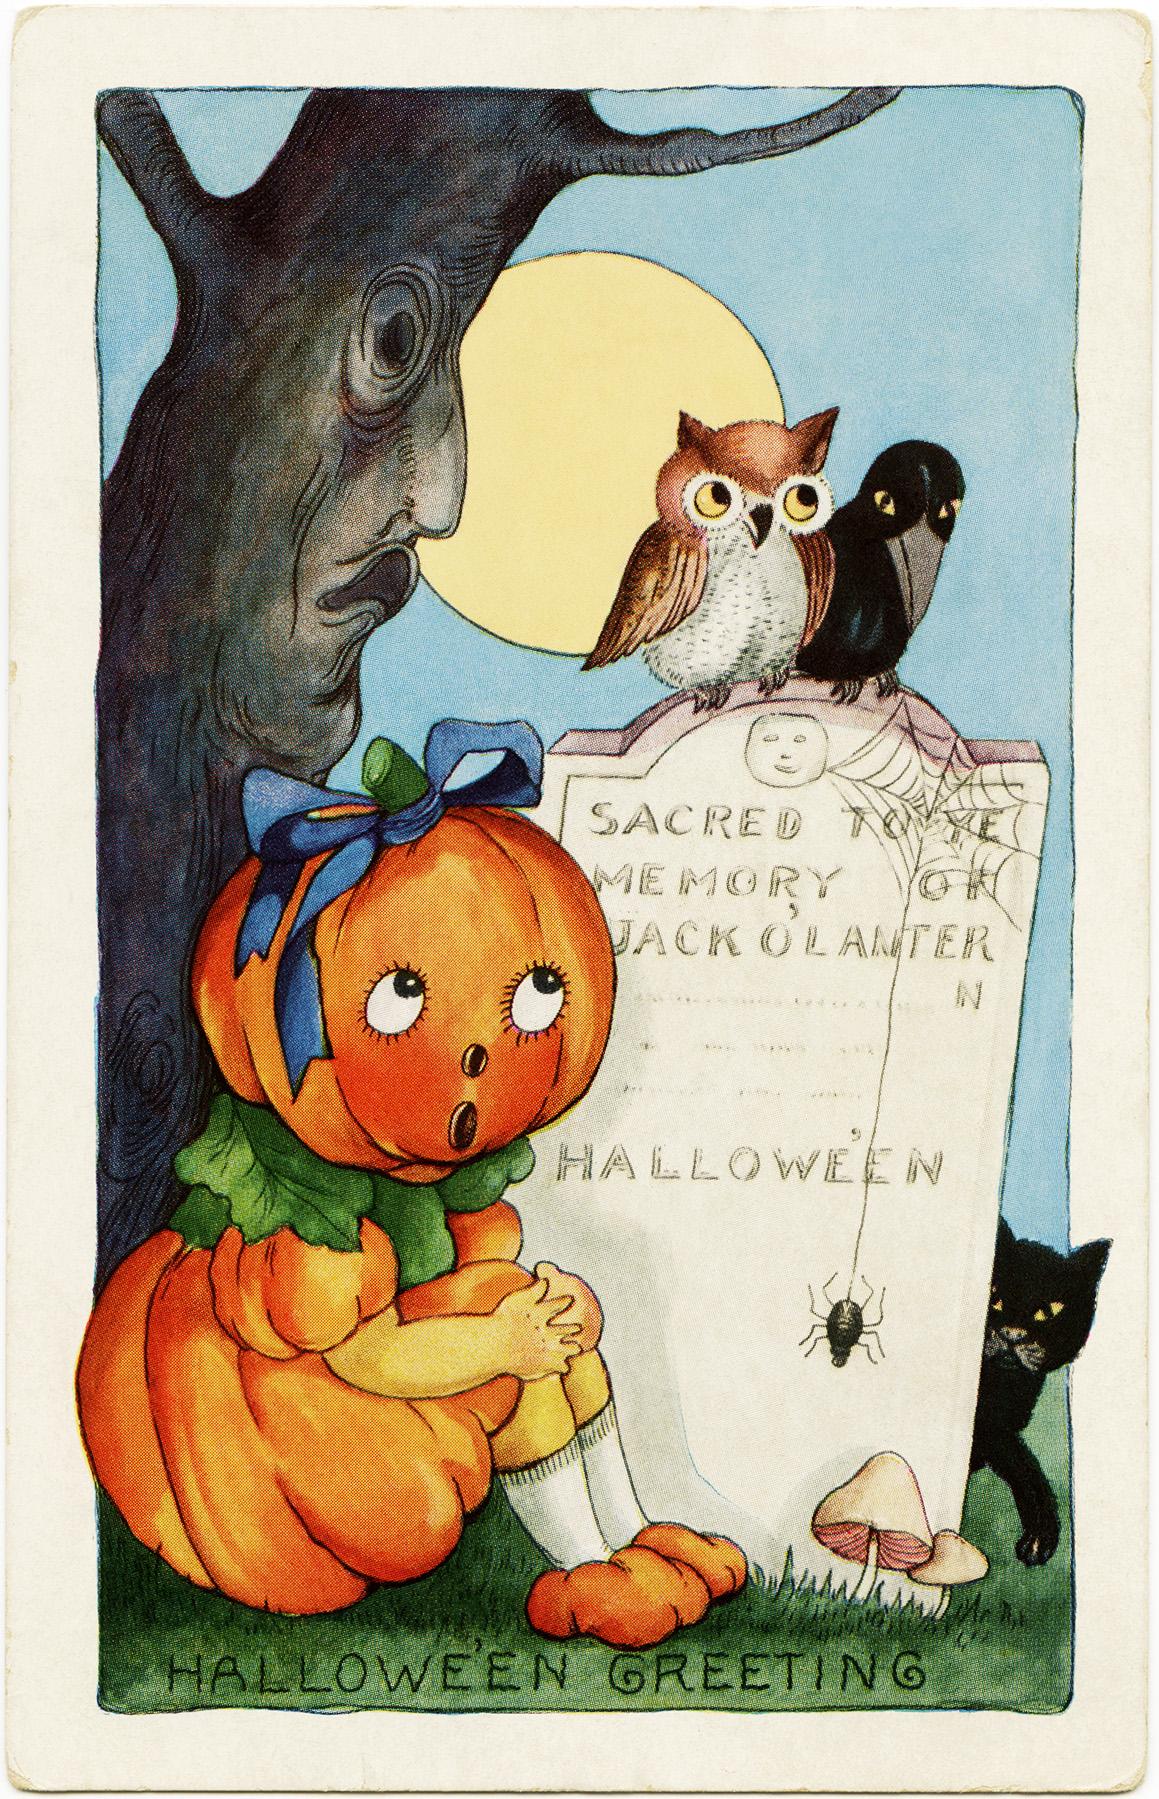 whitney halloween postcard, vintage halloween printable, pumpkin girl owl crow black cat, jack o lantern grave headstone, child halloween image